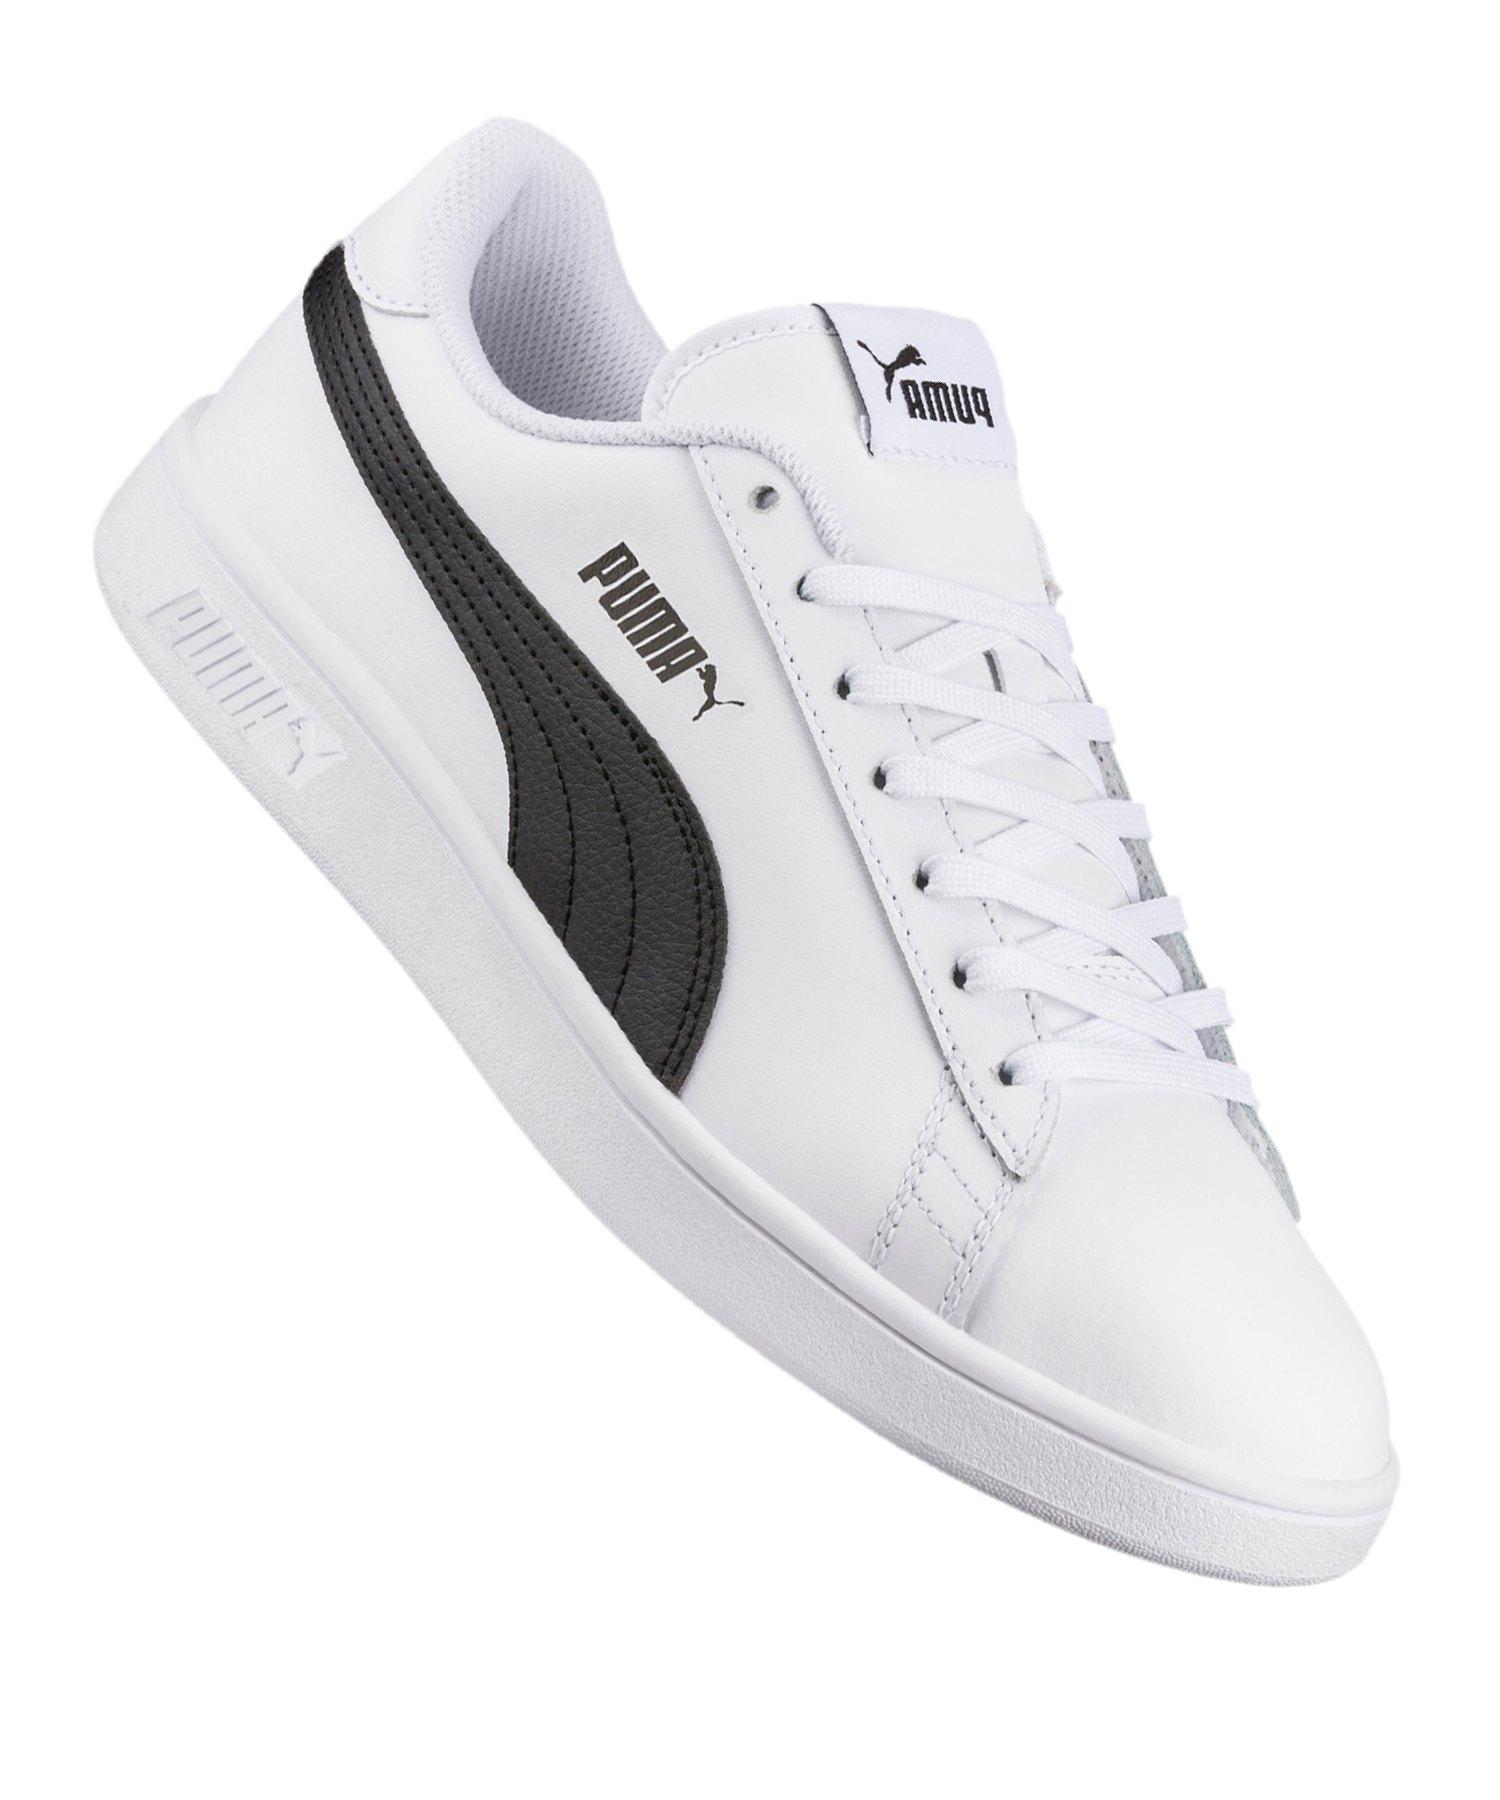 PUMA Smash v2 L Sneaker Weiss F01 - weiss